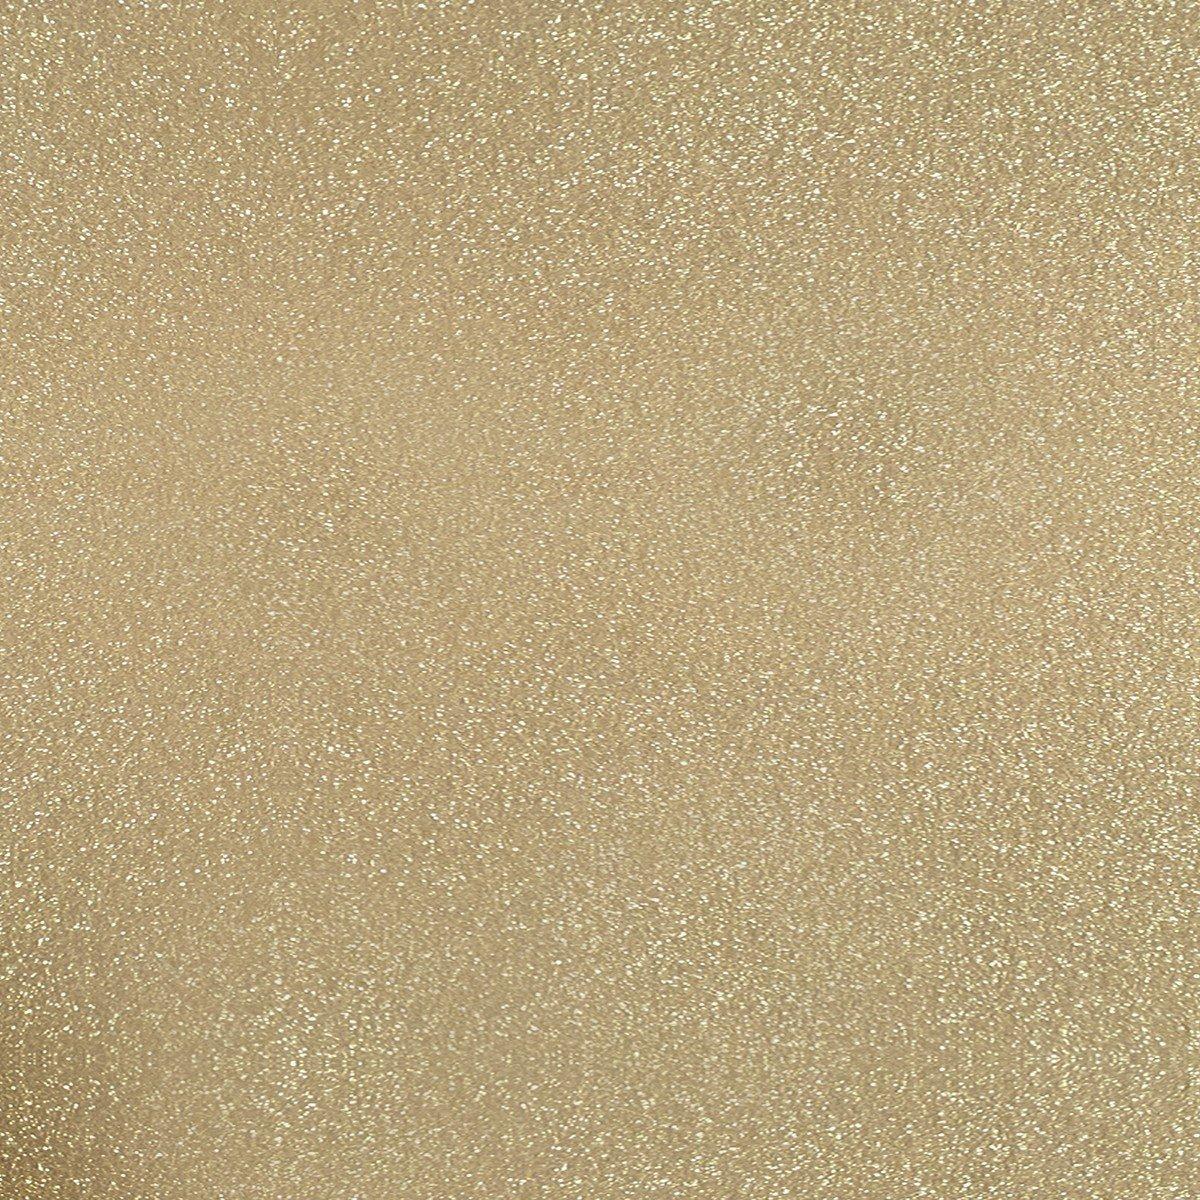 Rust-Oleum 323859 Glitter Interior Wall Paint, Quart, Harvest Gold ...